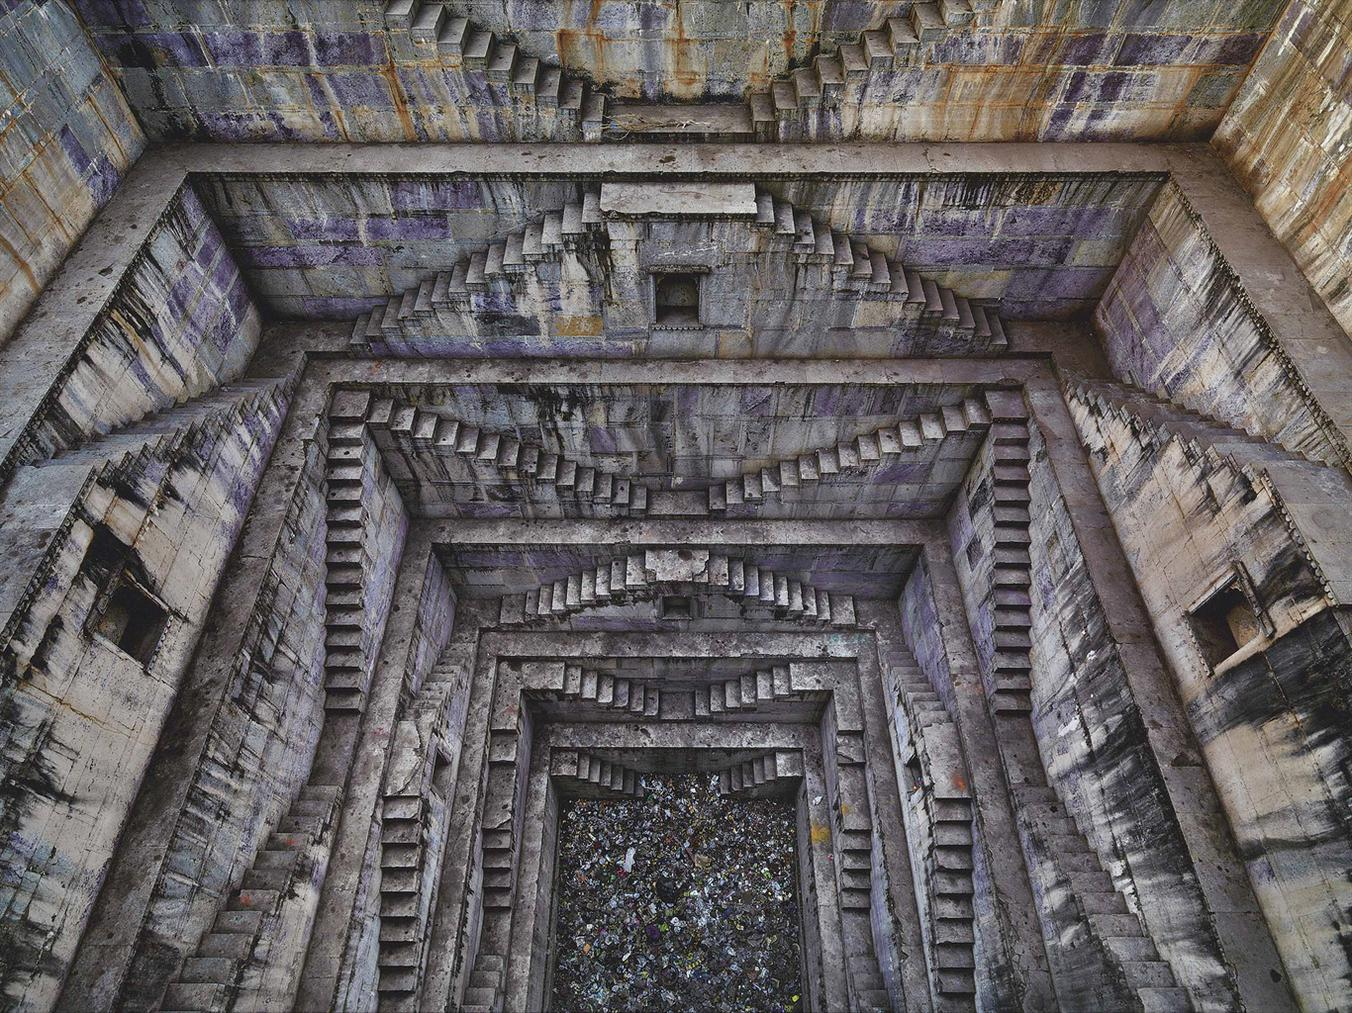 Edward Burtynsky-Stepwell #4, Sagar Kund Baori, Bundi, Rajasthan, India-2010